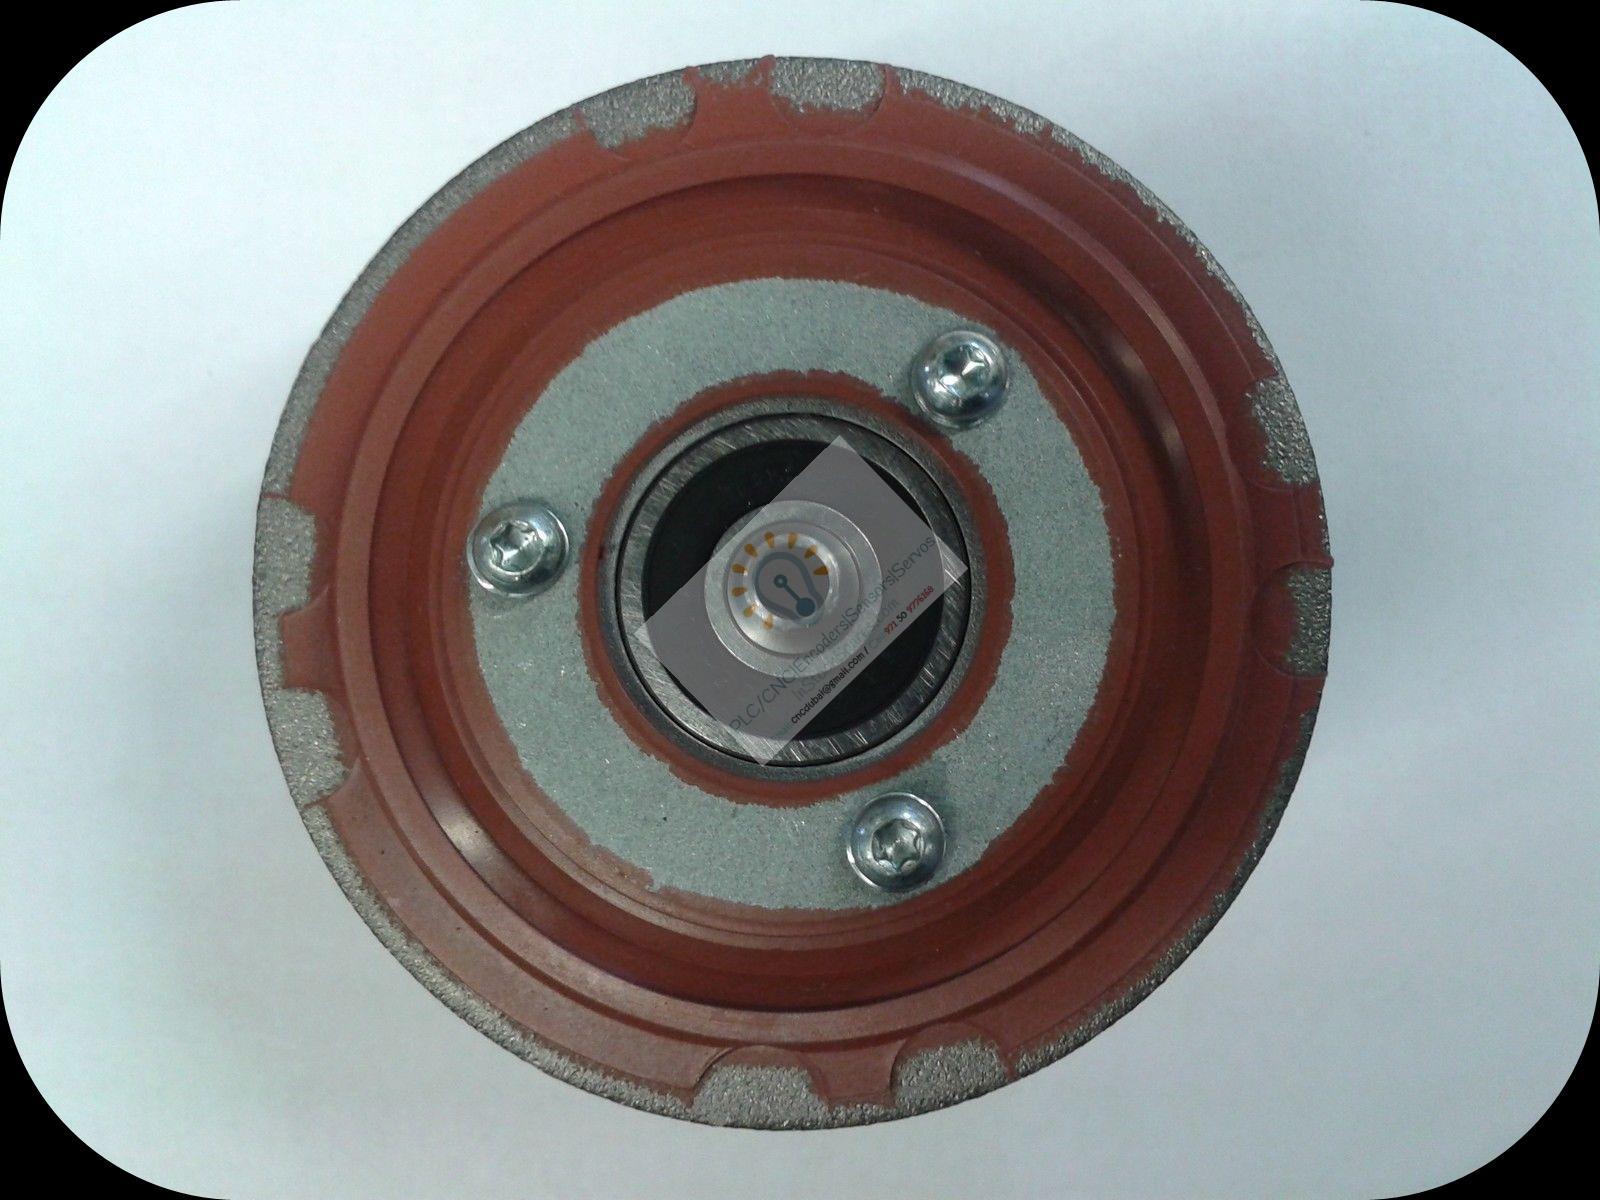 hengstler encoder wiring diagram pioneer deh 1050e sick sew dubai motorfedback srm50 hzao s32